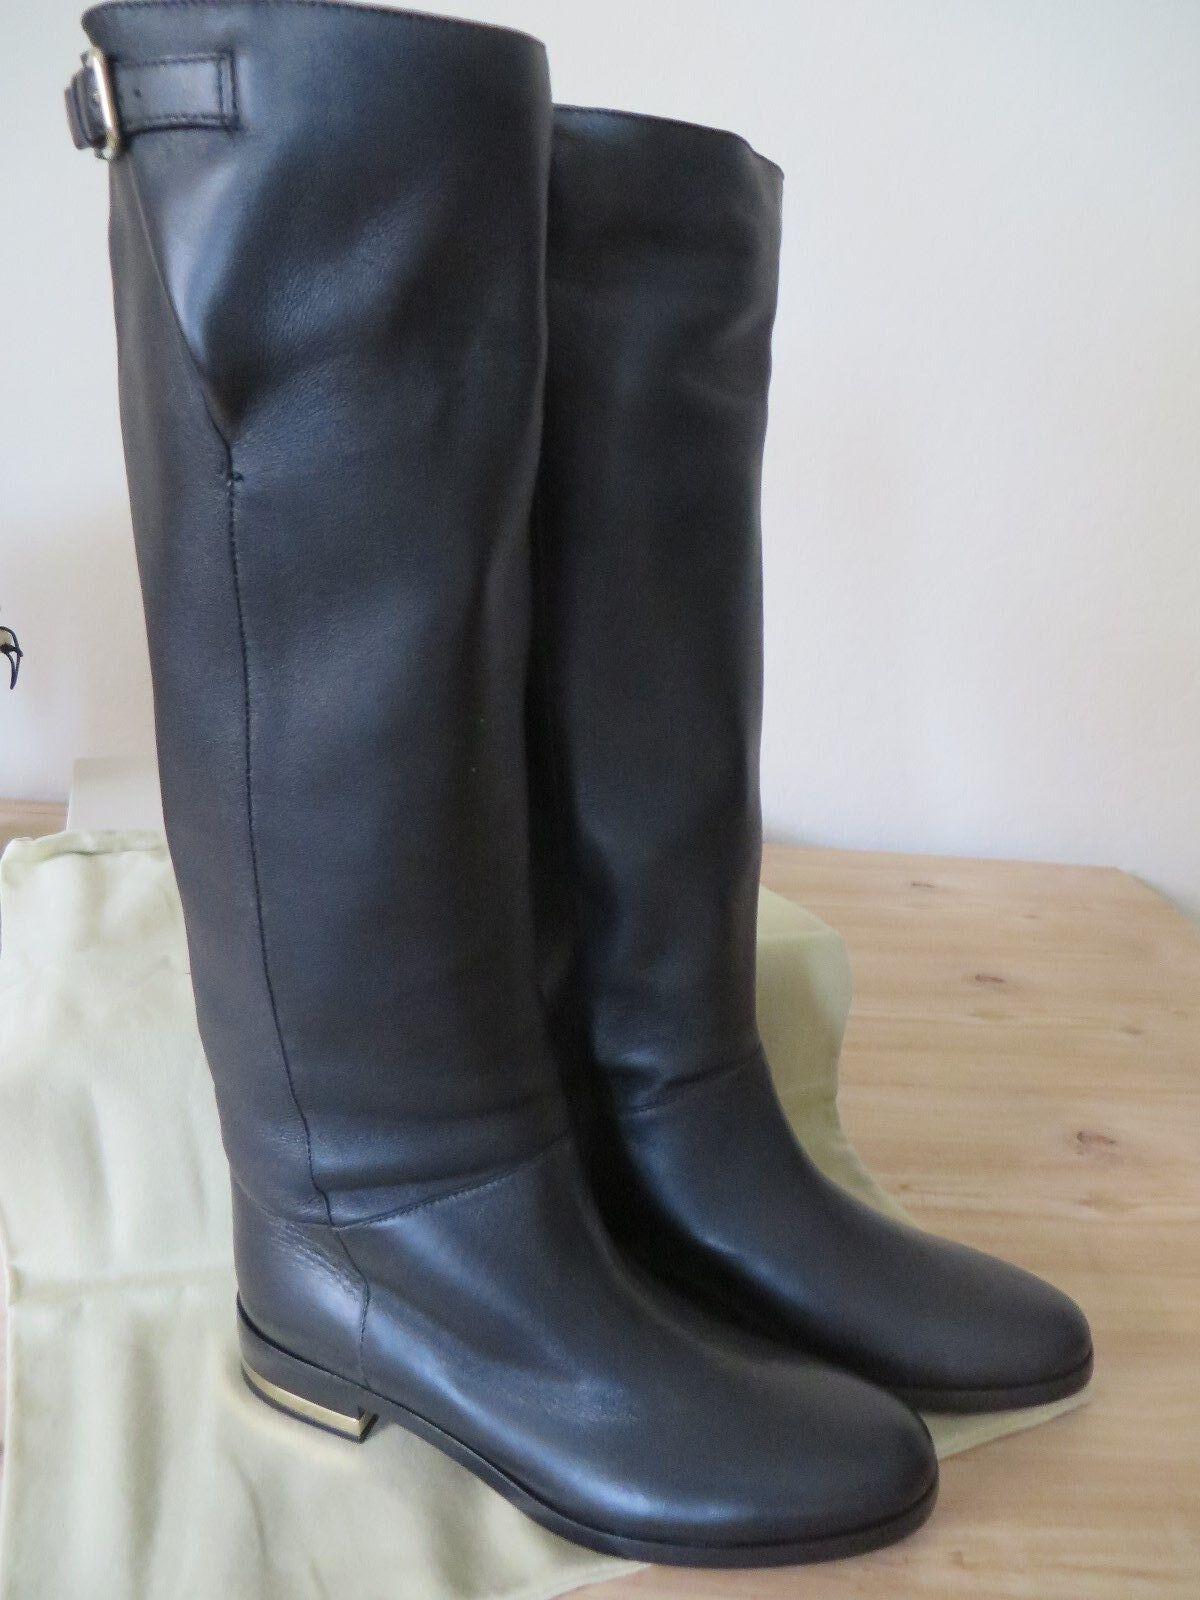 BurberryHouse     Black Leather  Boot   38.5 Eur MSRP   895.00 c725d8